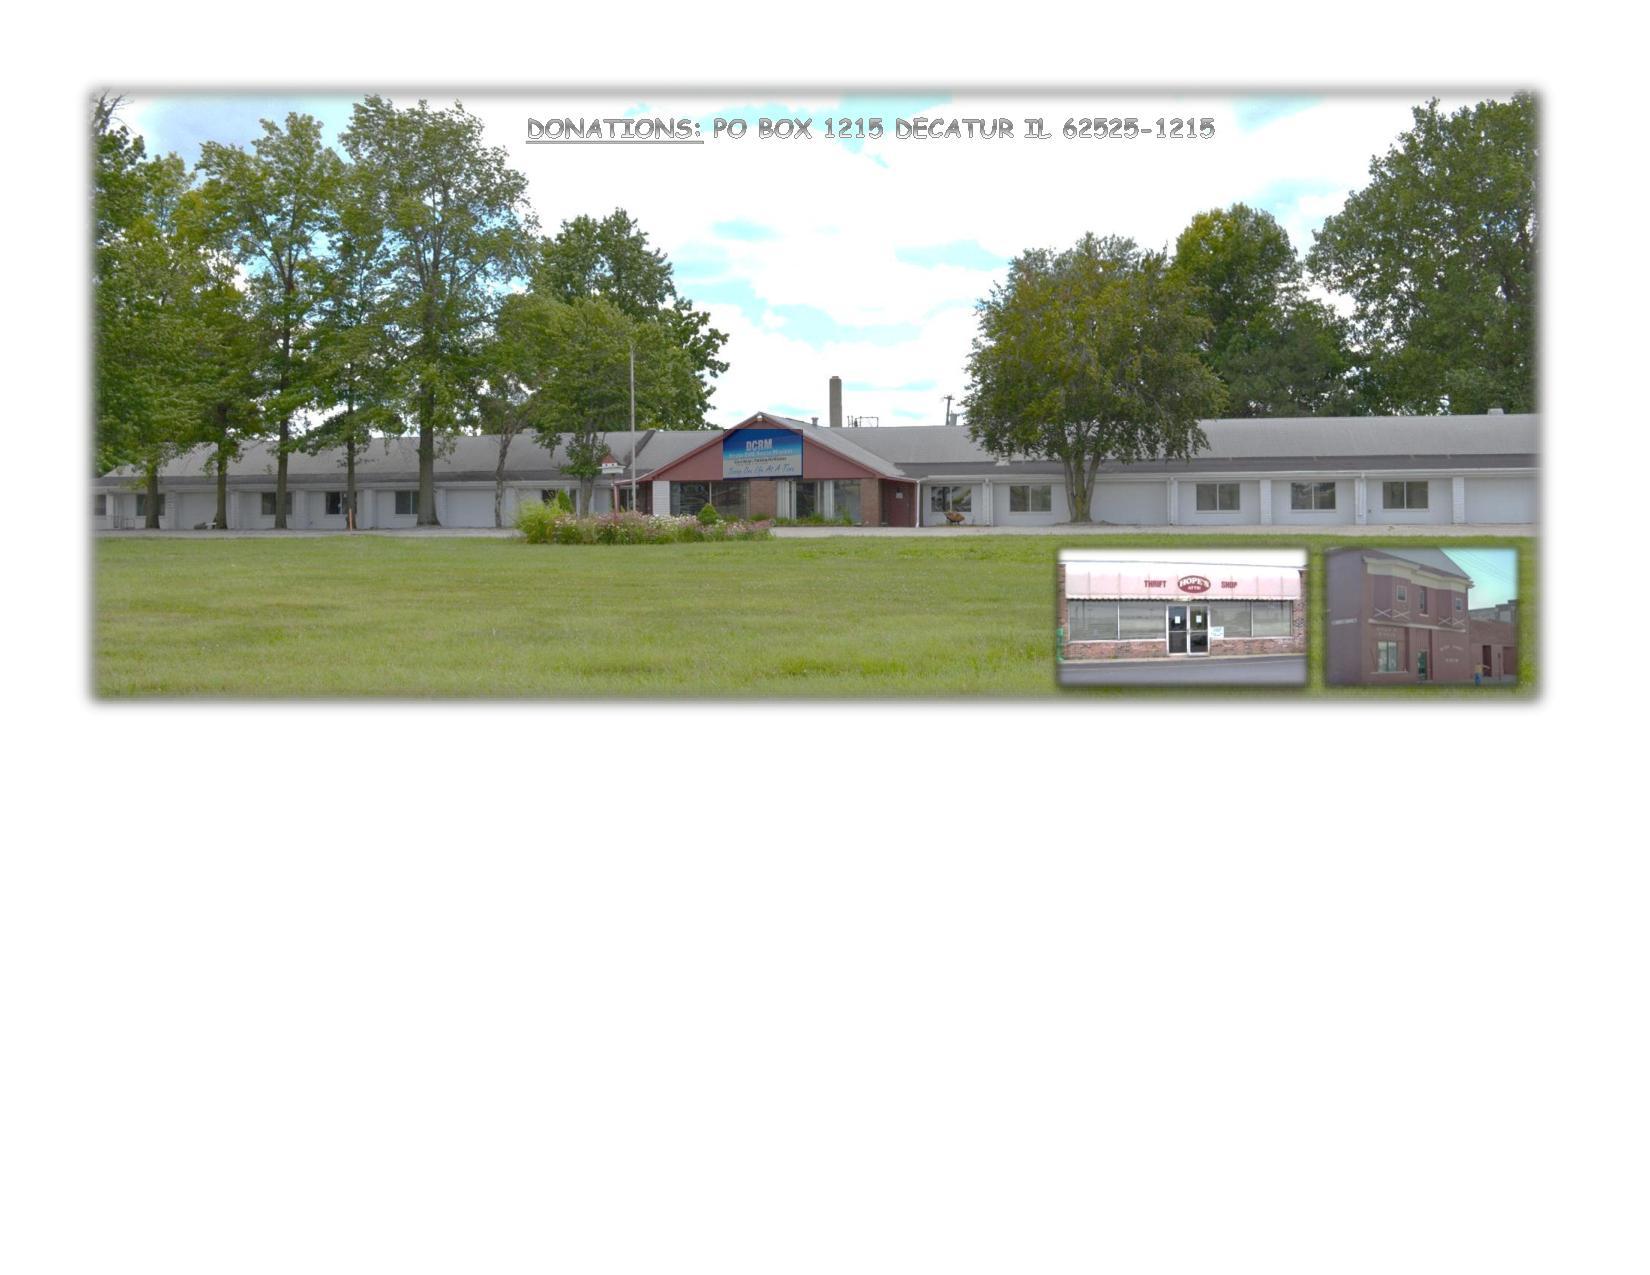 Grace House Shelter for Women and Children